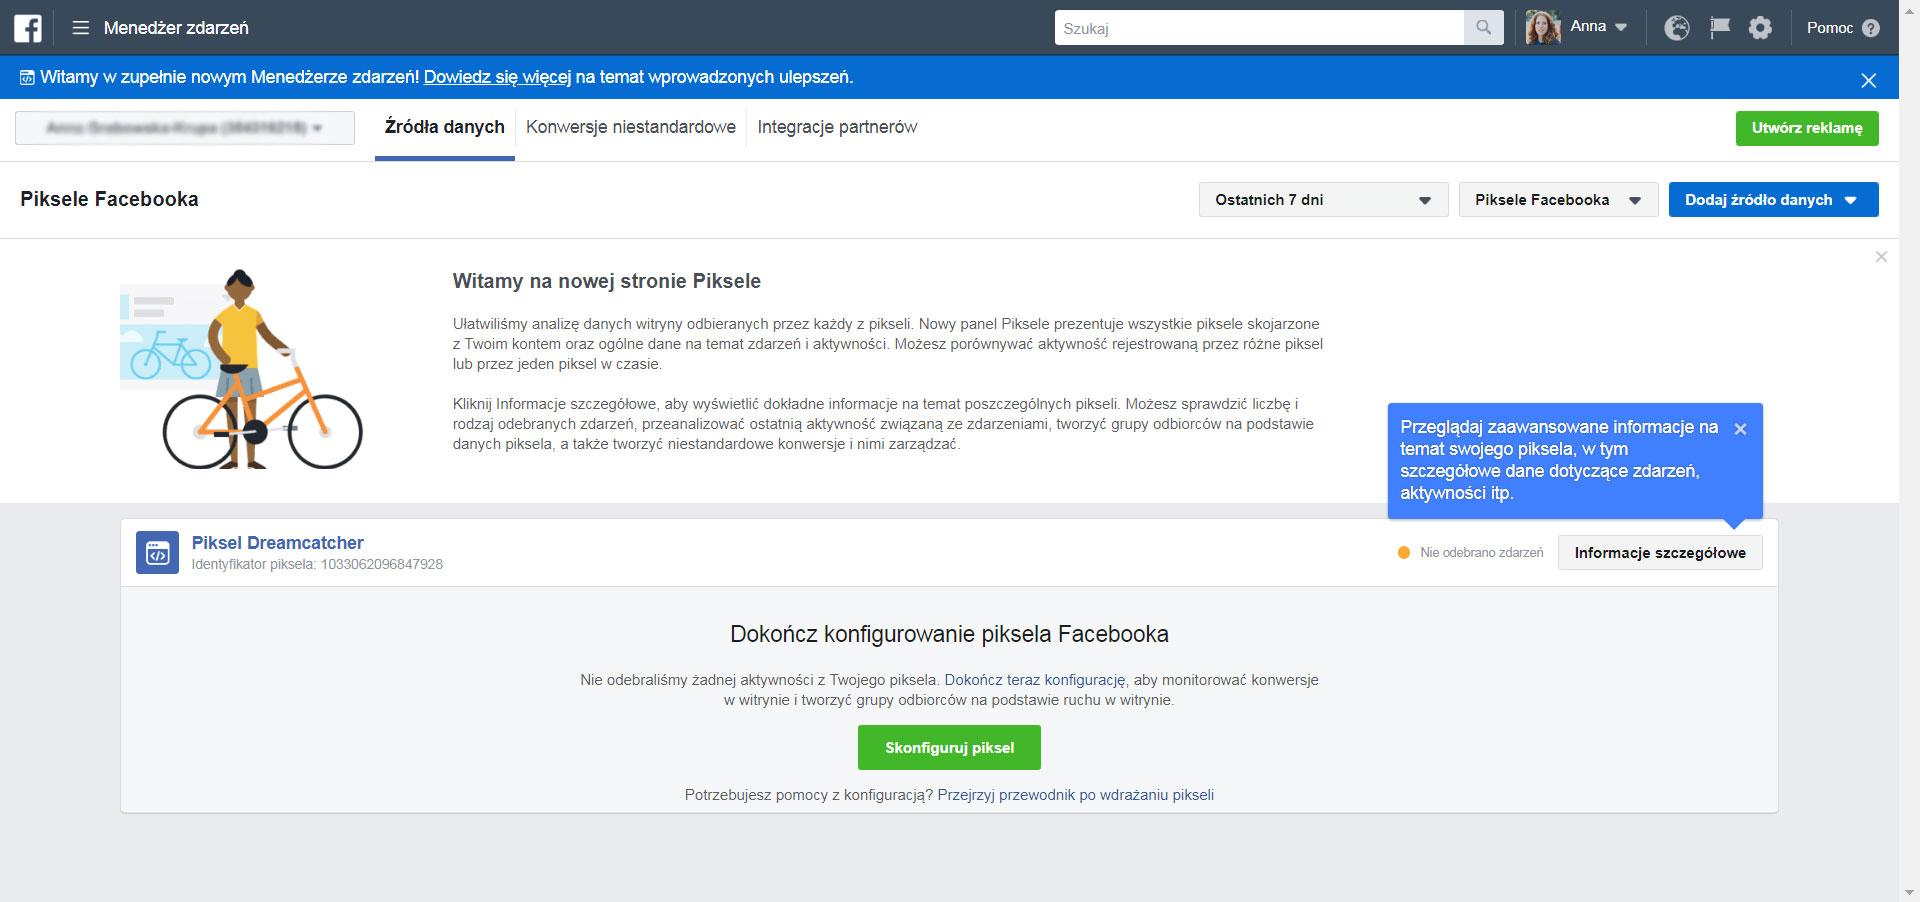 Piksel facebooka - krok 9